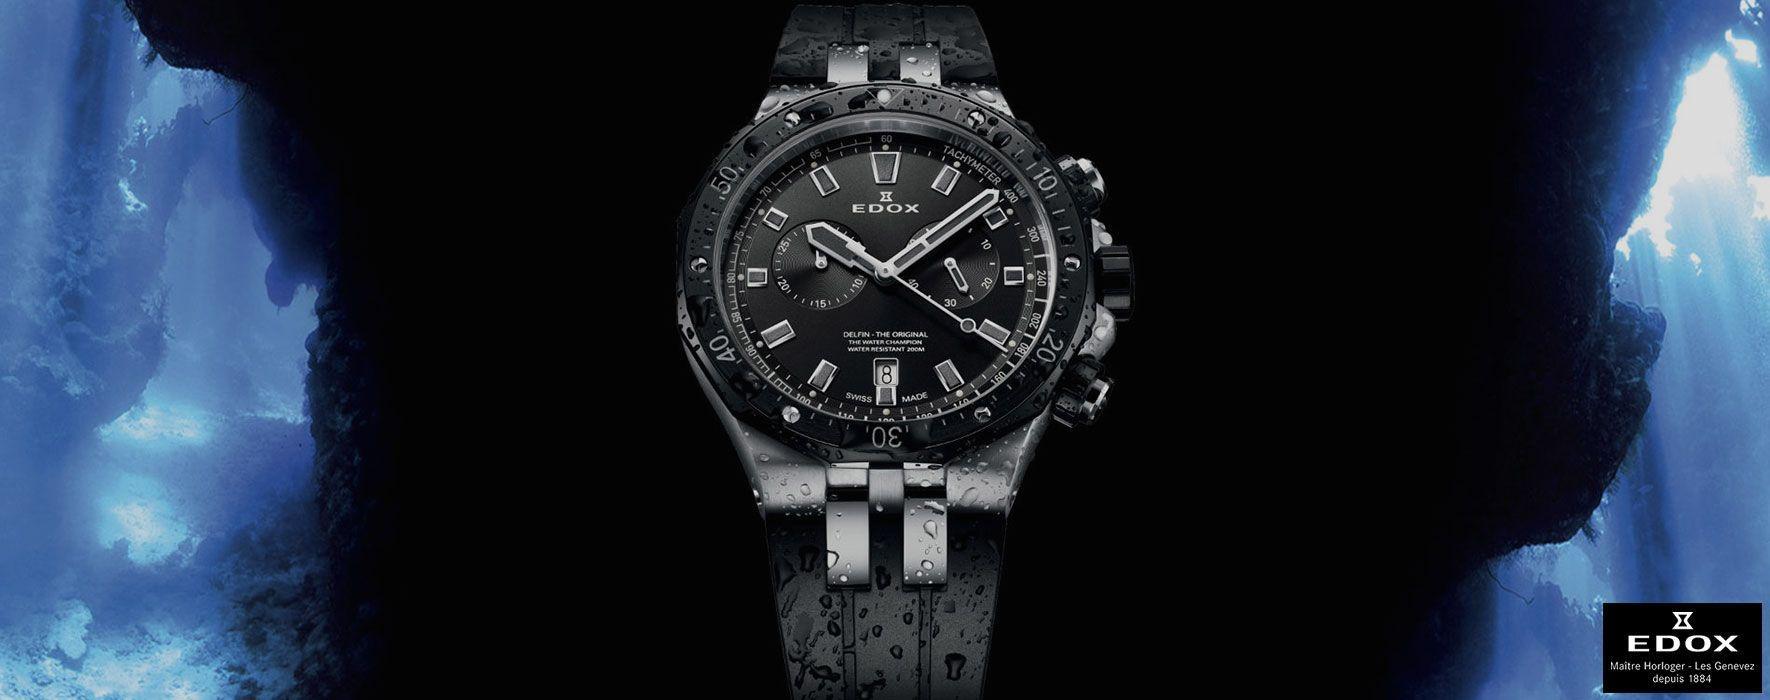 Site horloger Edox